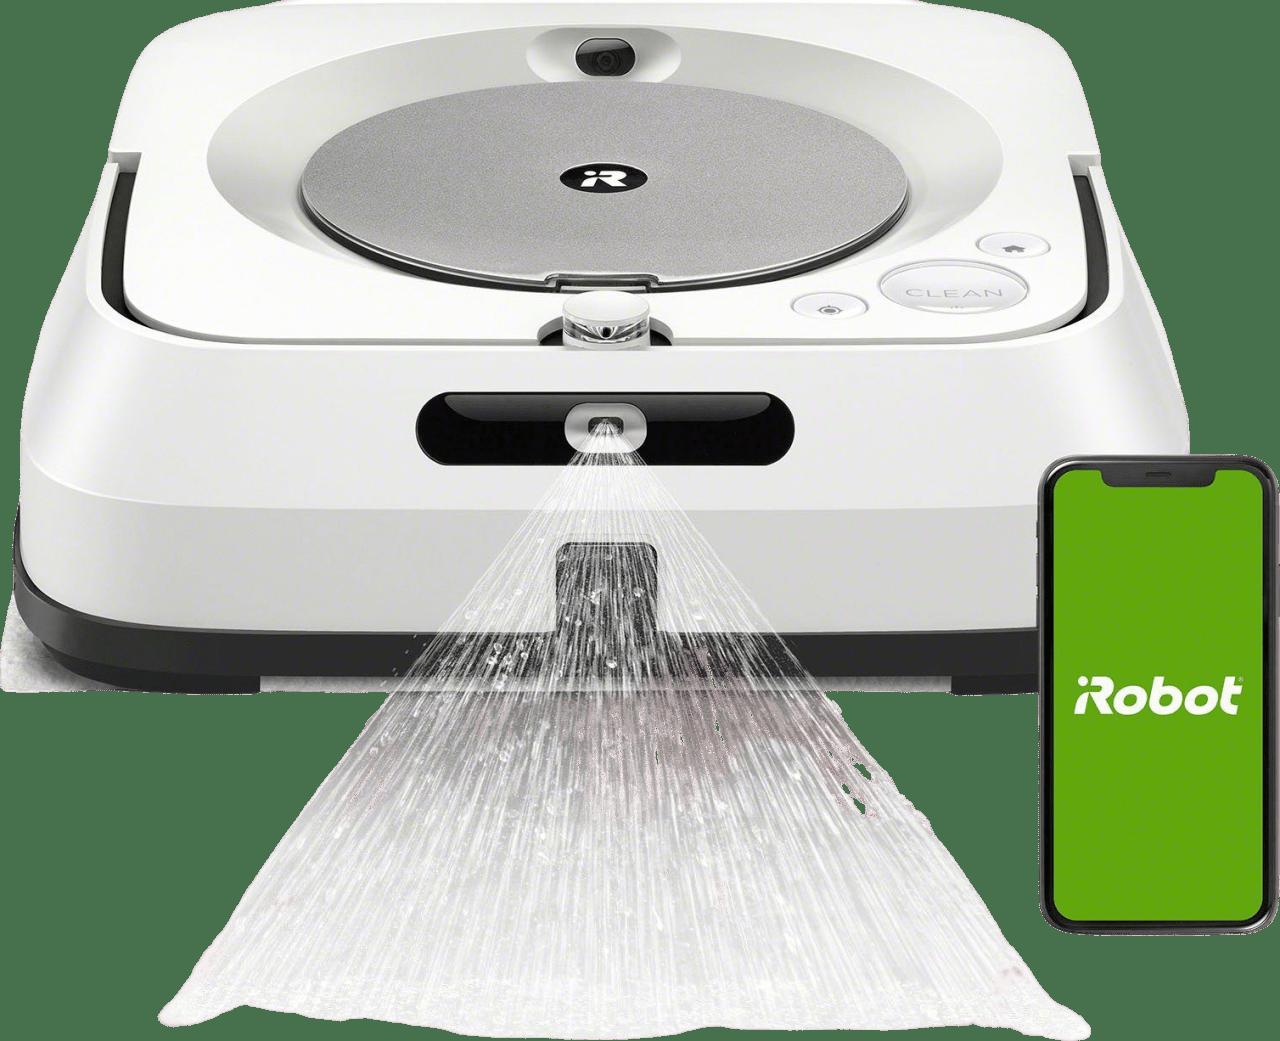 White iRobot Braava jet m6 Mopping Robot.1